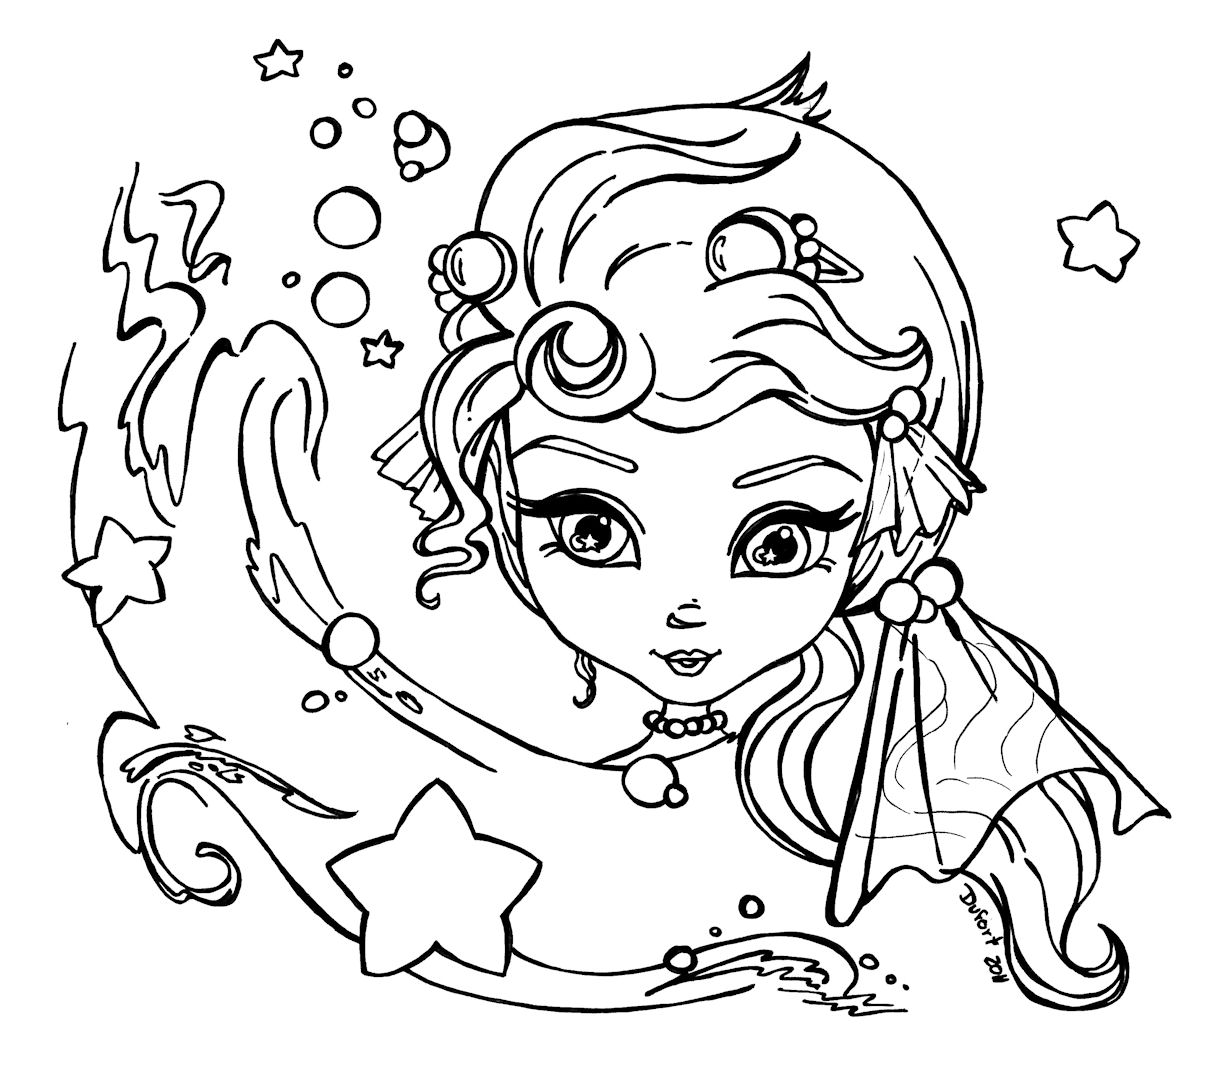 The Zodiac Sign Pisces